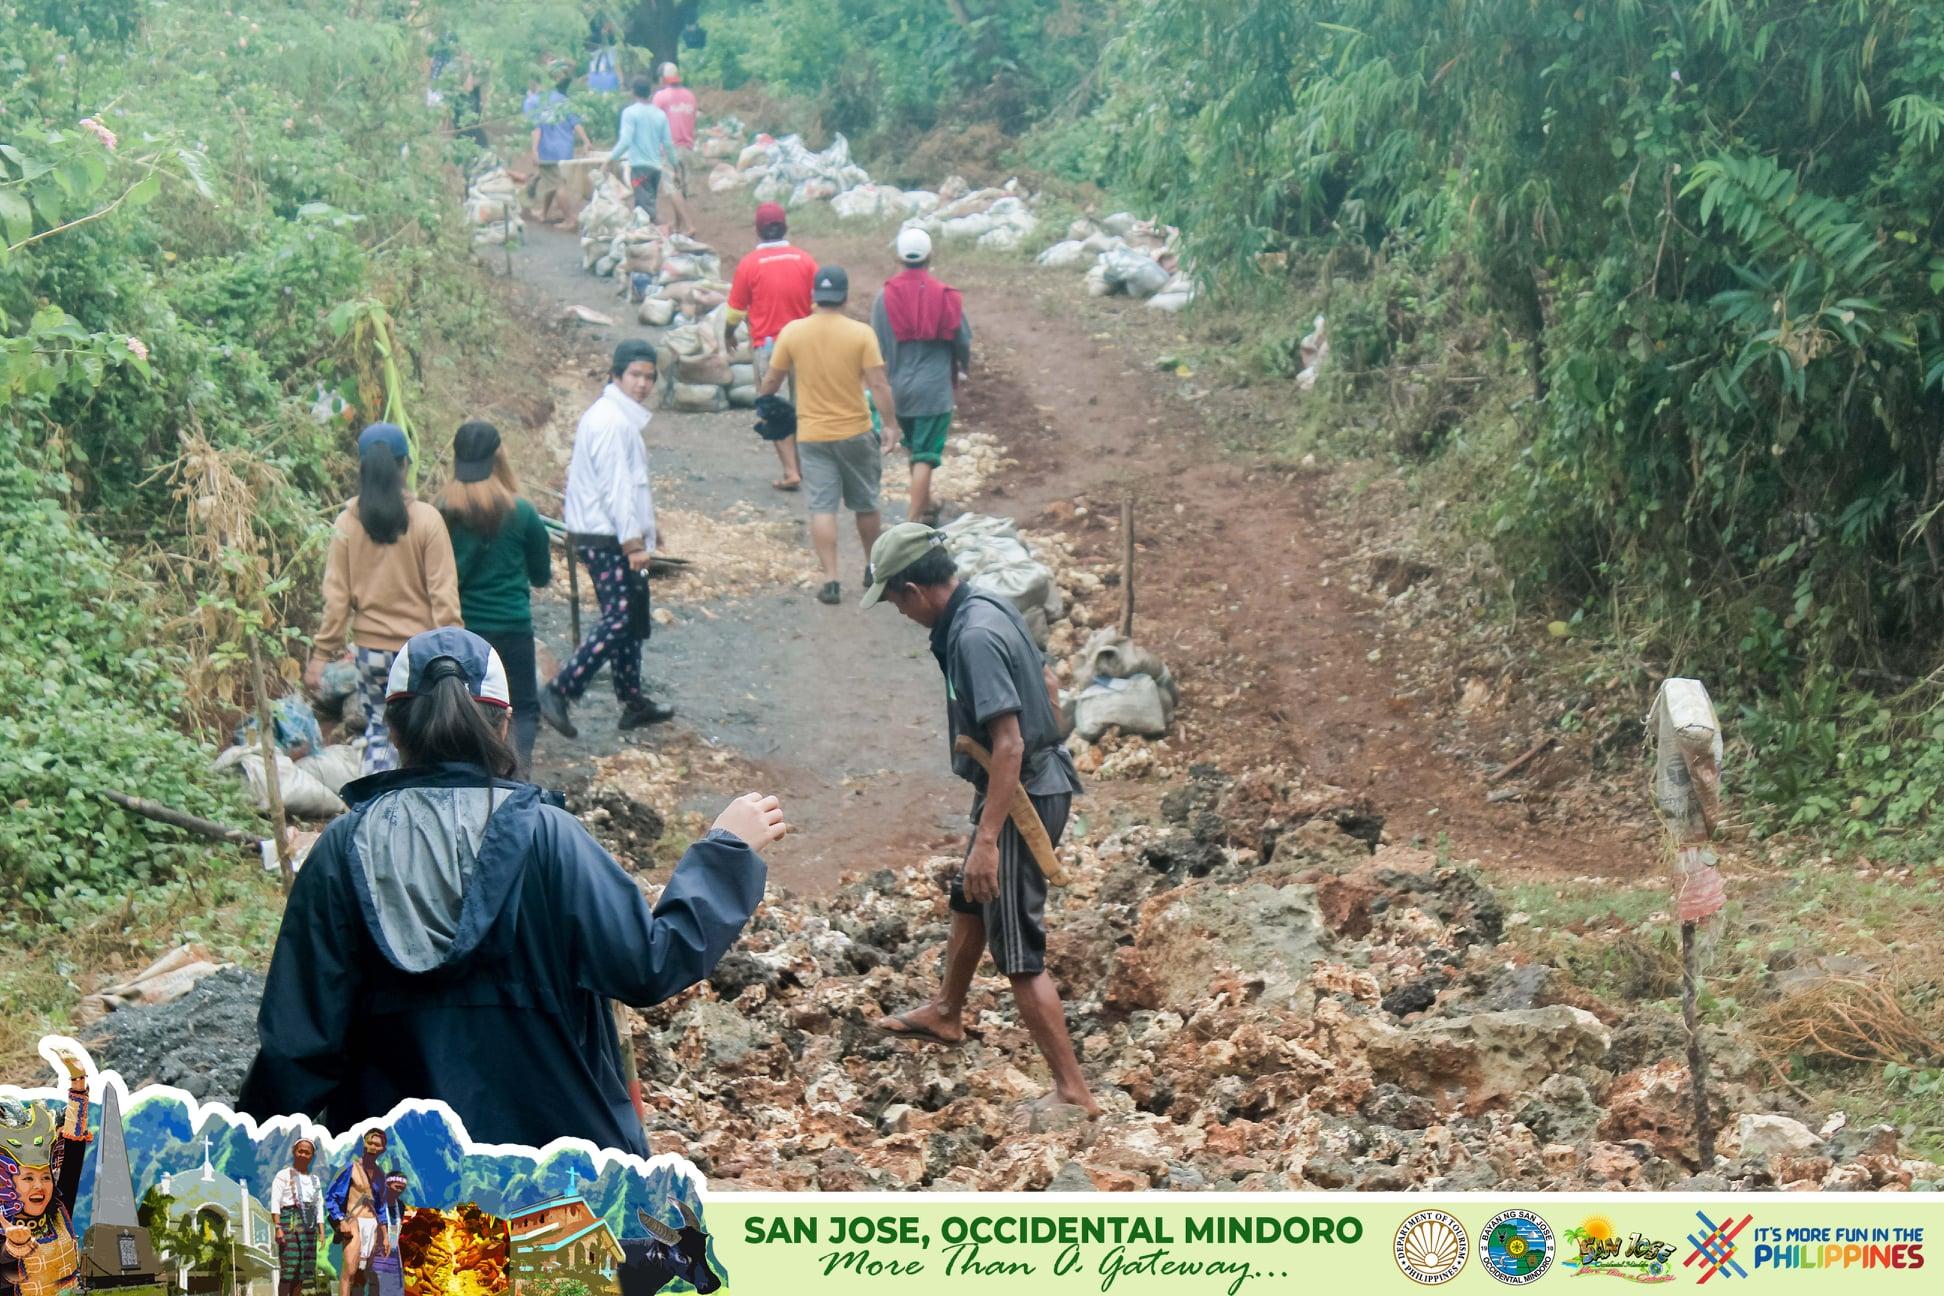 Tourism Ridge Road Ilin Island, San Jose, Occidental Mindoro